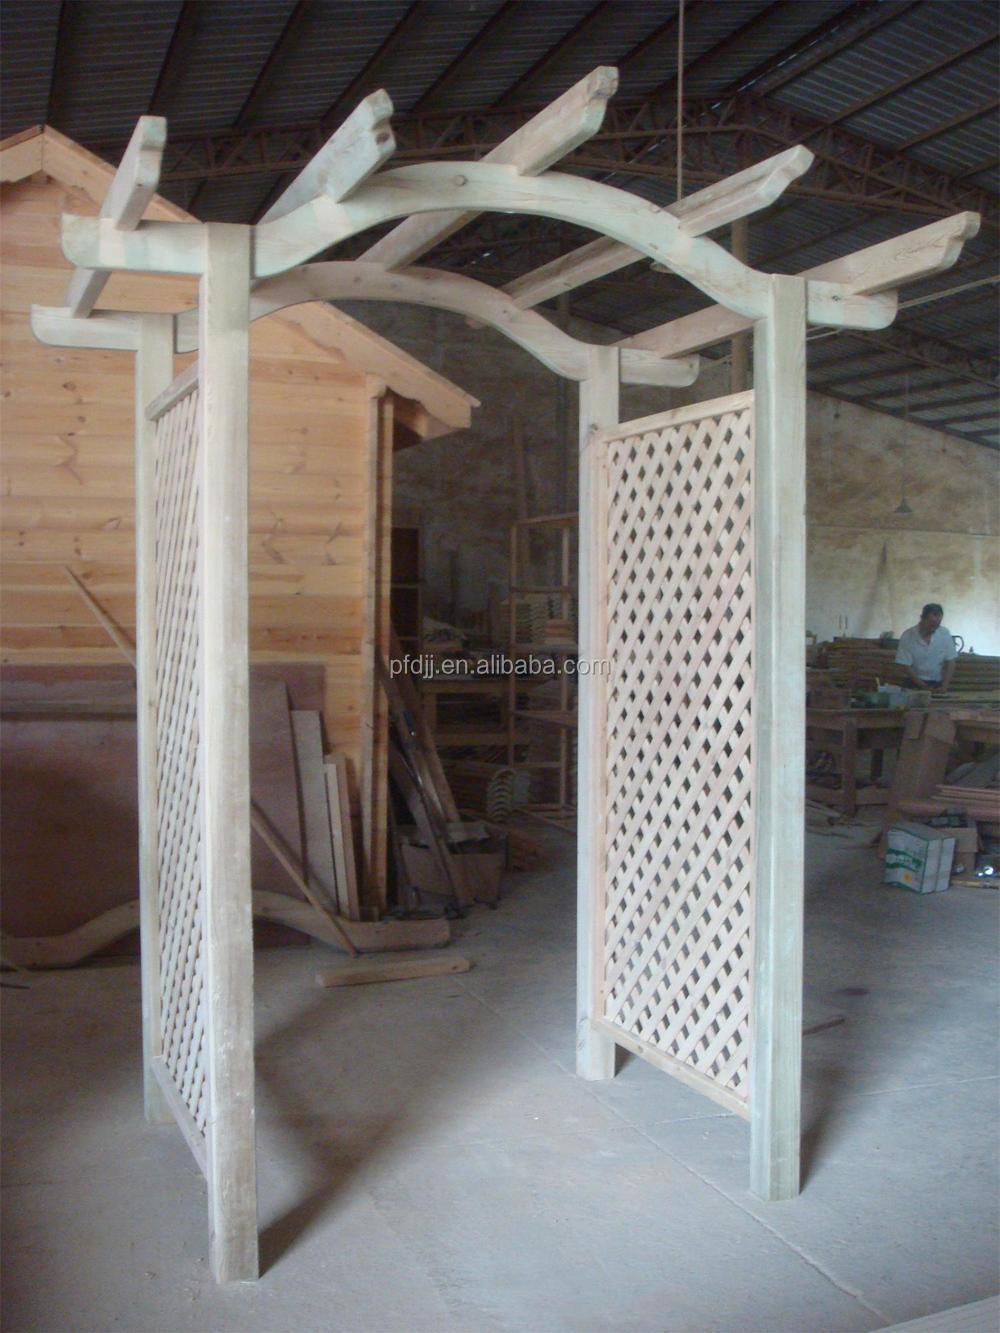 Prefabricated Wooden Gazebo Hot Tub Manual Assembly